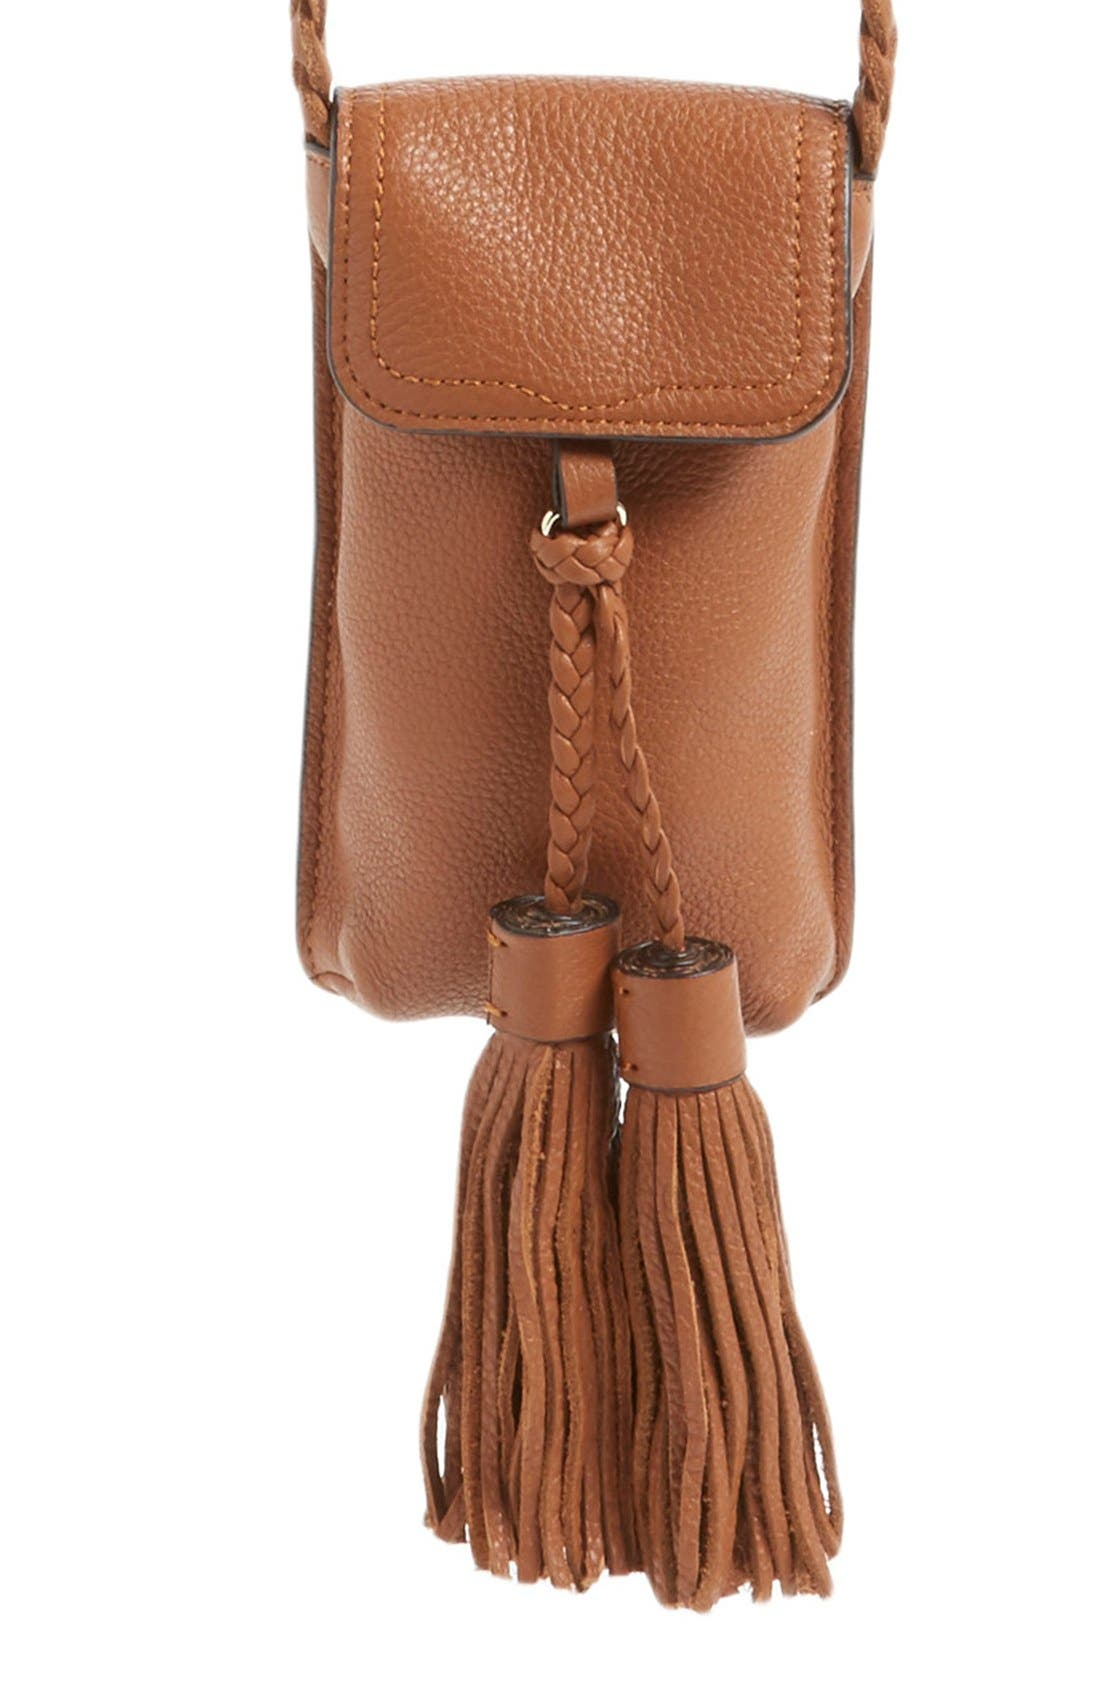 Alternate Image 1 Selected - Rebecca Minkoff Isobel Phone Crossbody Bag